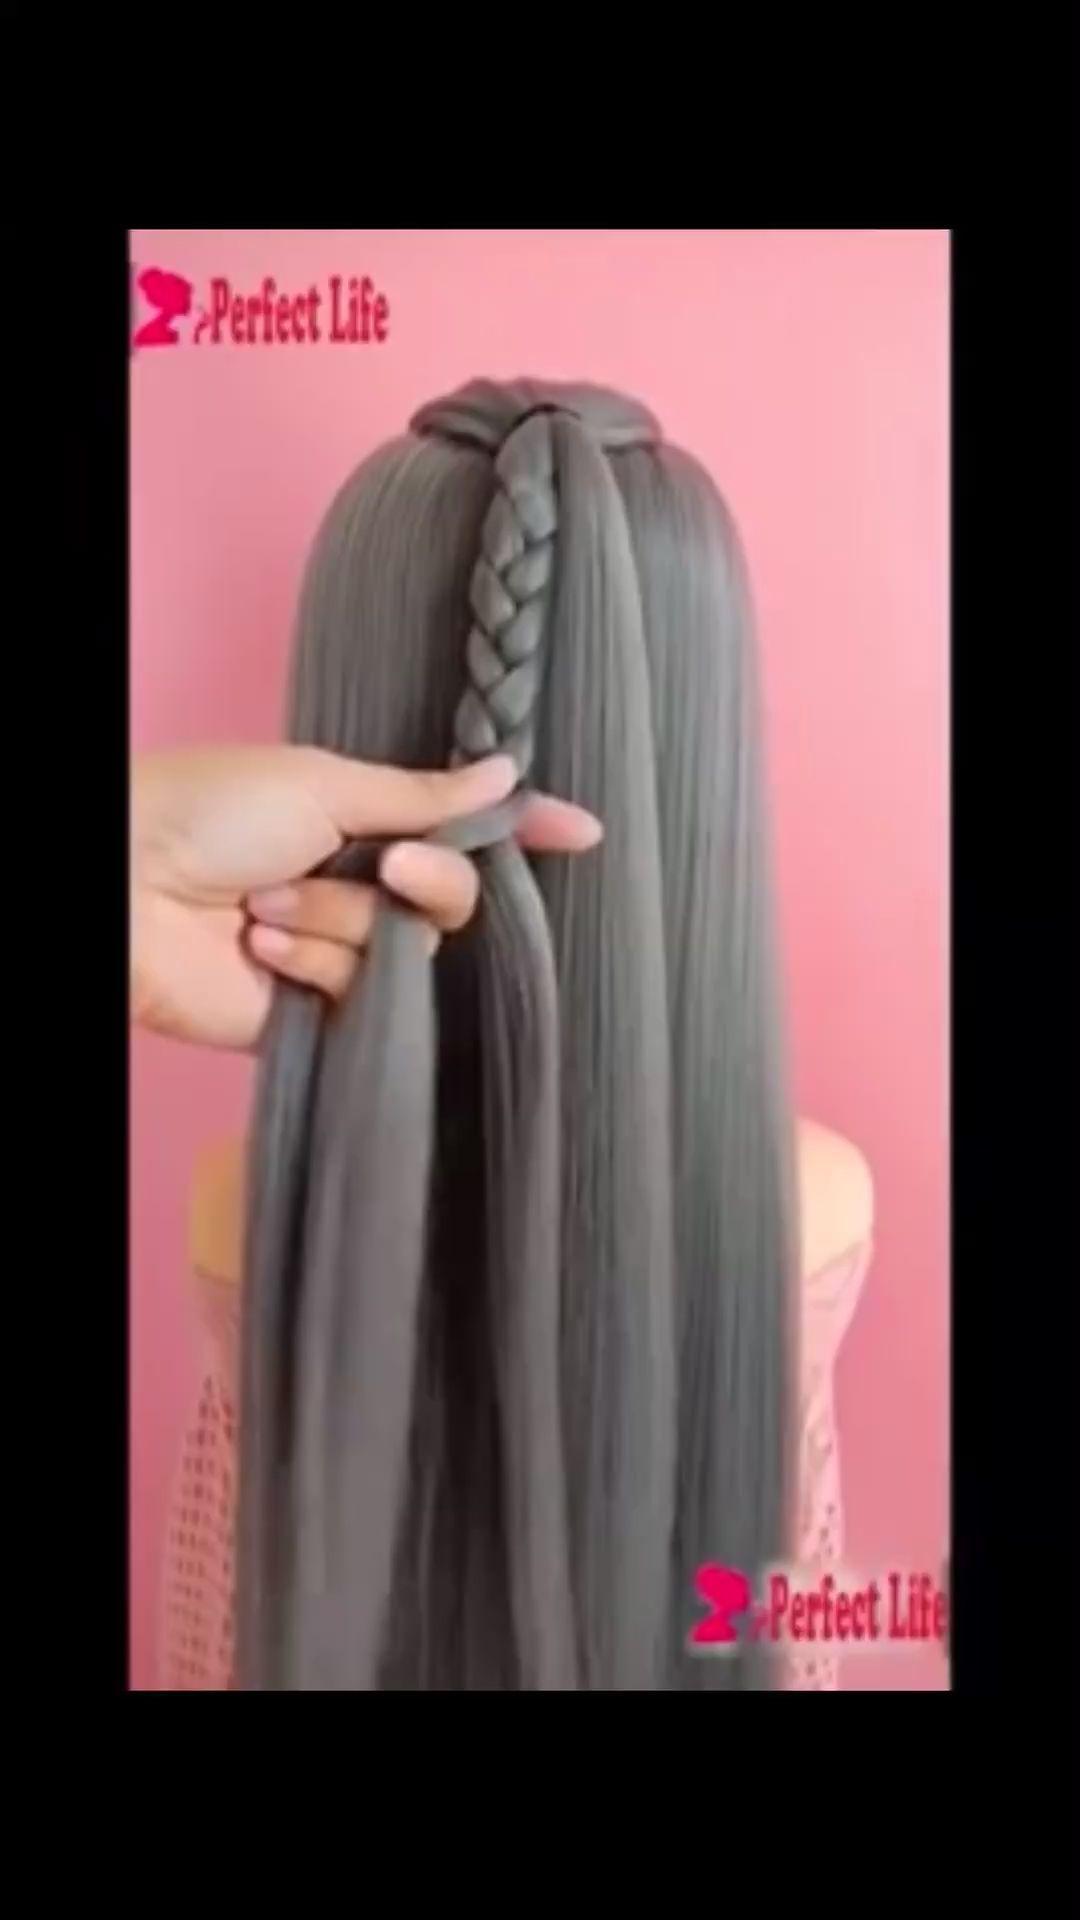 Pin By Laura Russel On Peinados De Novias In 2020 Hair Videos Hair Styles Short Hair Styles